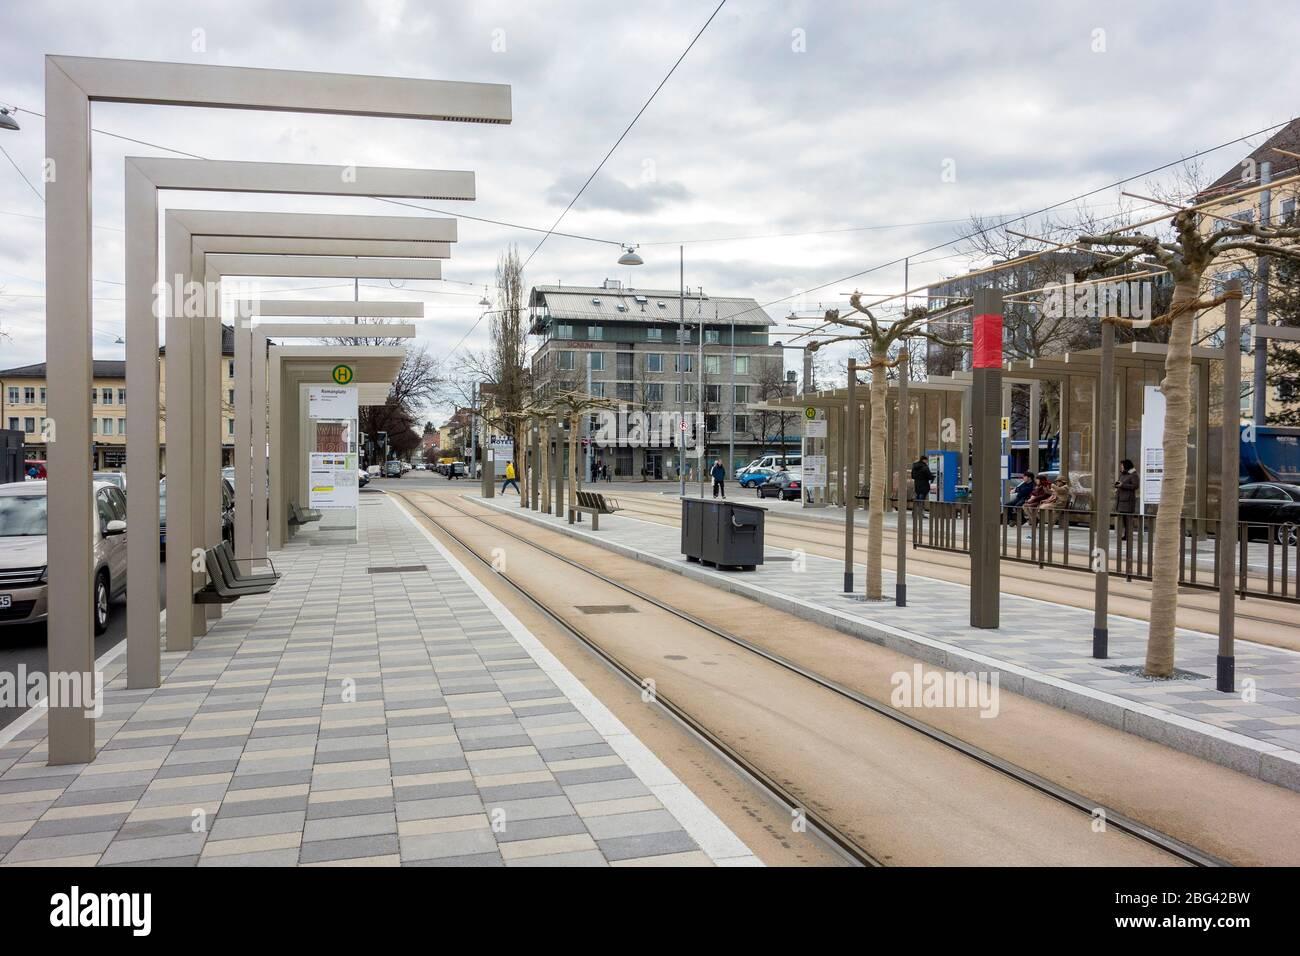 New Tram Station, Romanplatz, München, Germany Stock Photo